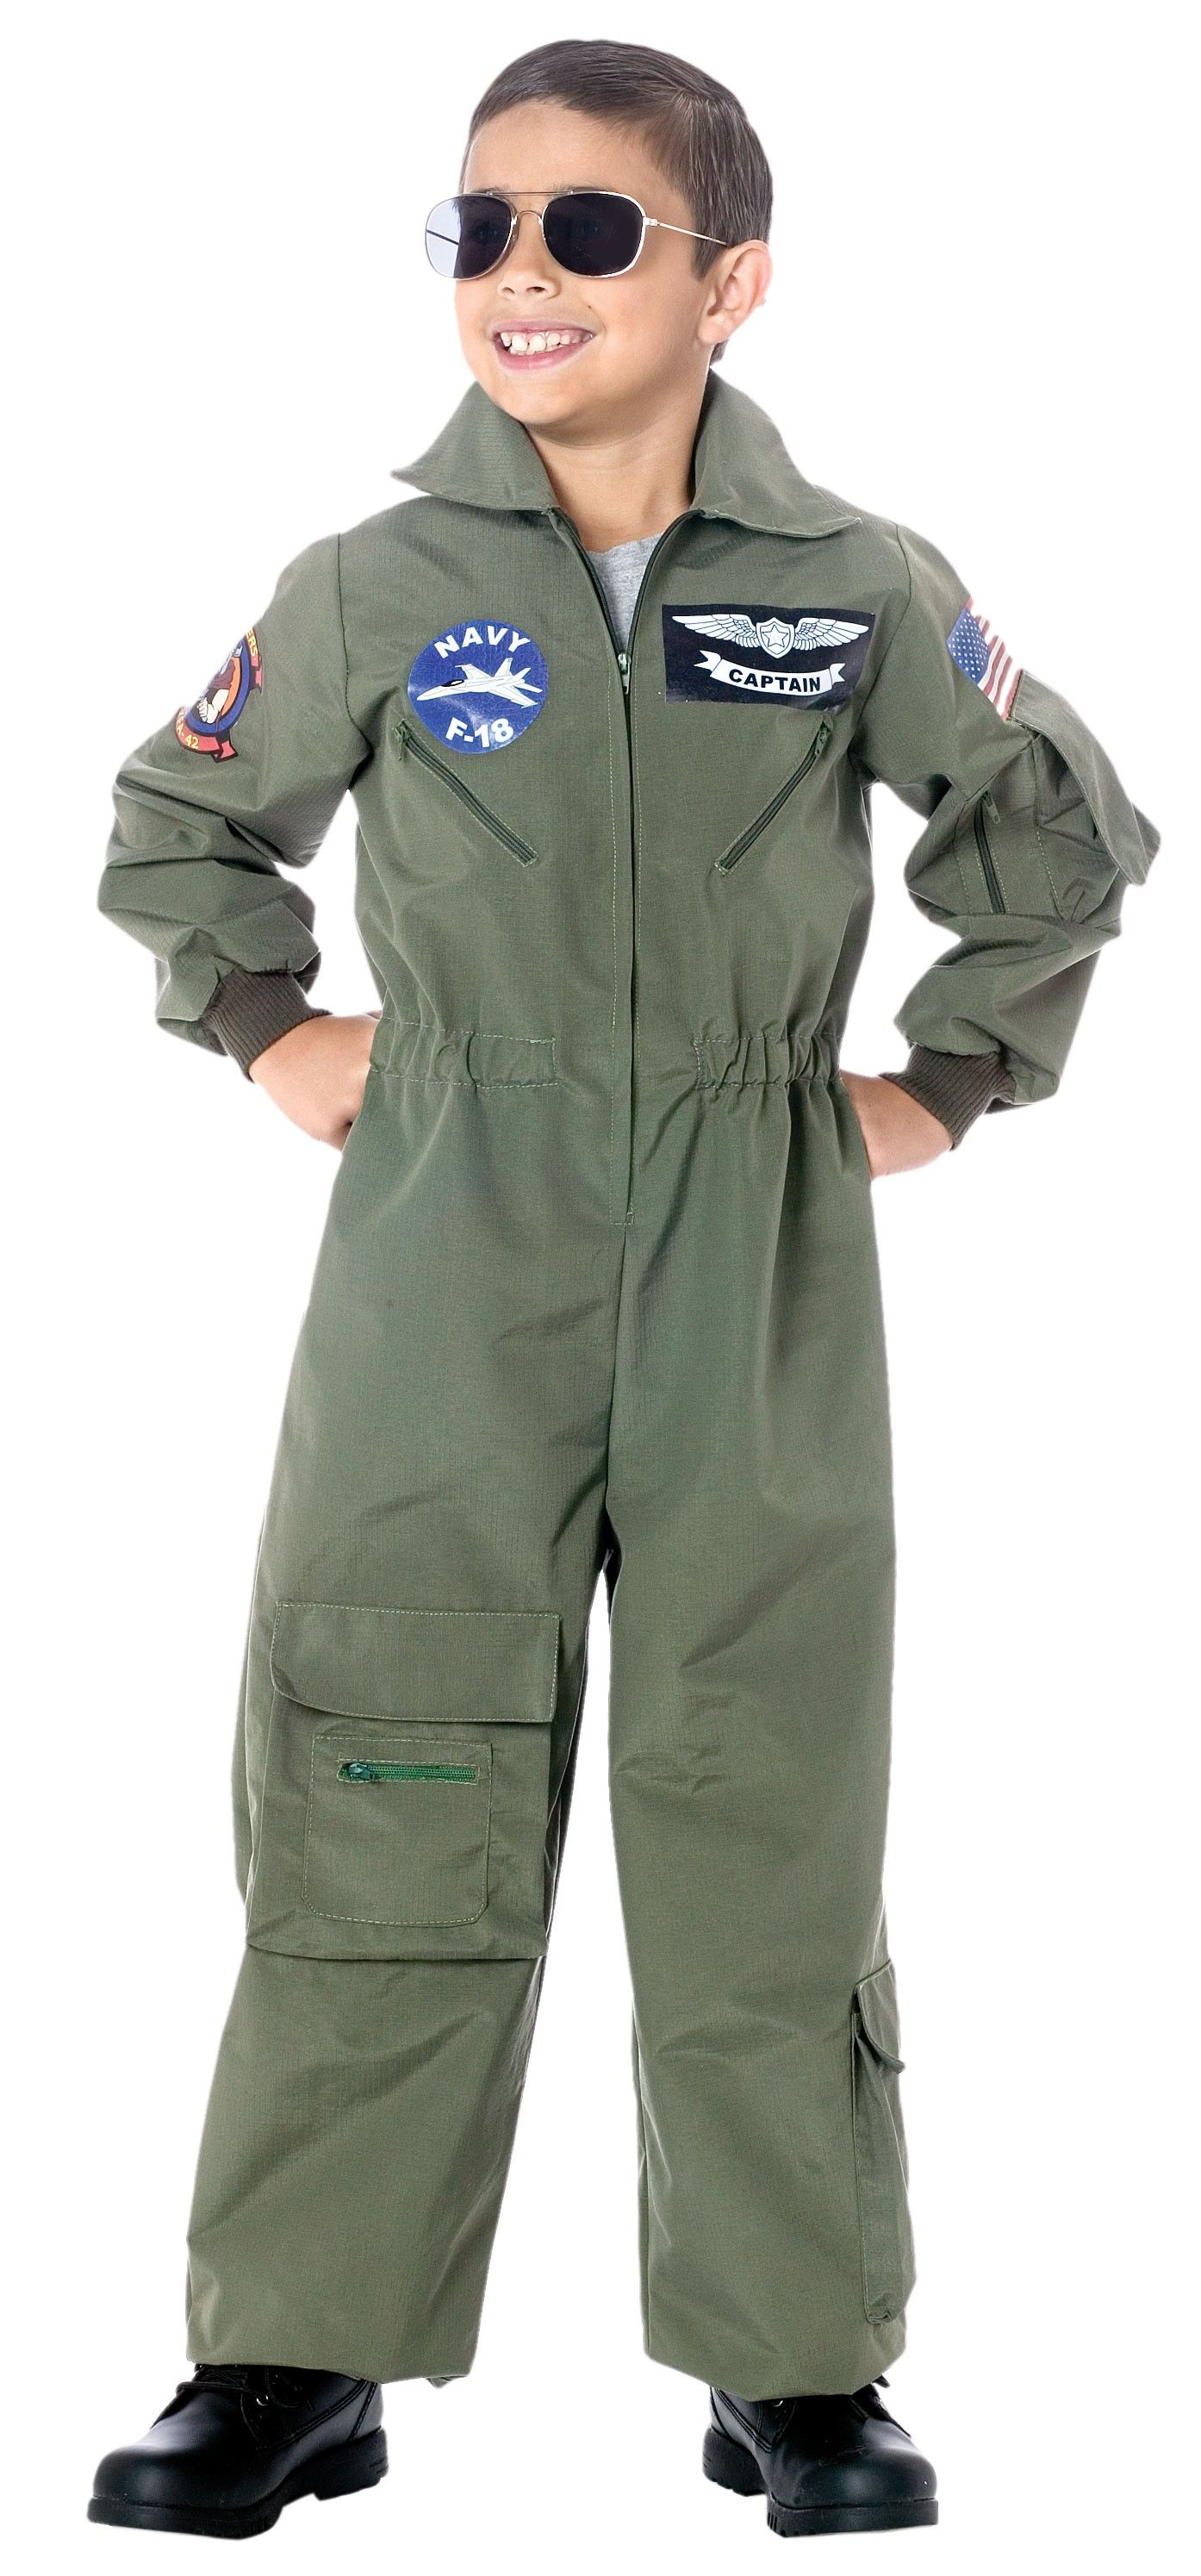 Children's Air Force Pilot Costume Pilot uniform, Kids